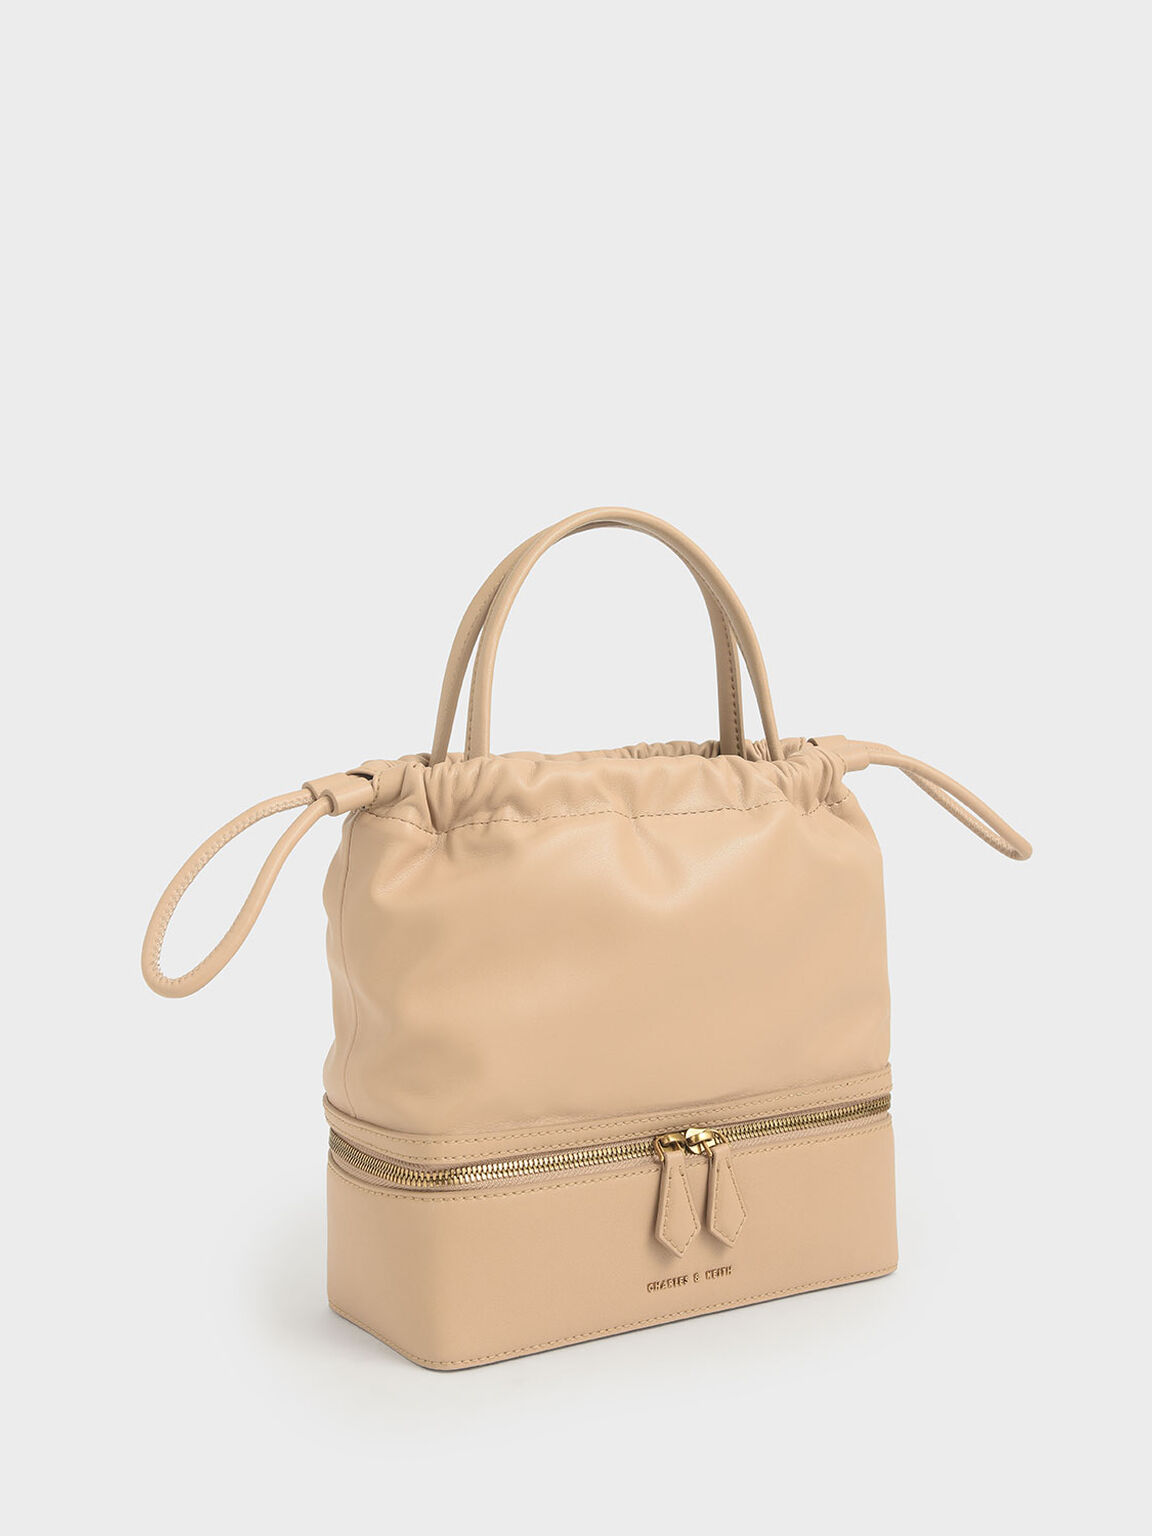 Two-Way Zip Drawstring Bag, Beige, hi-res